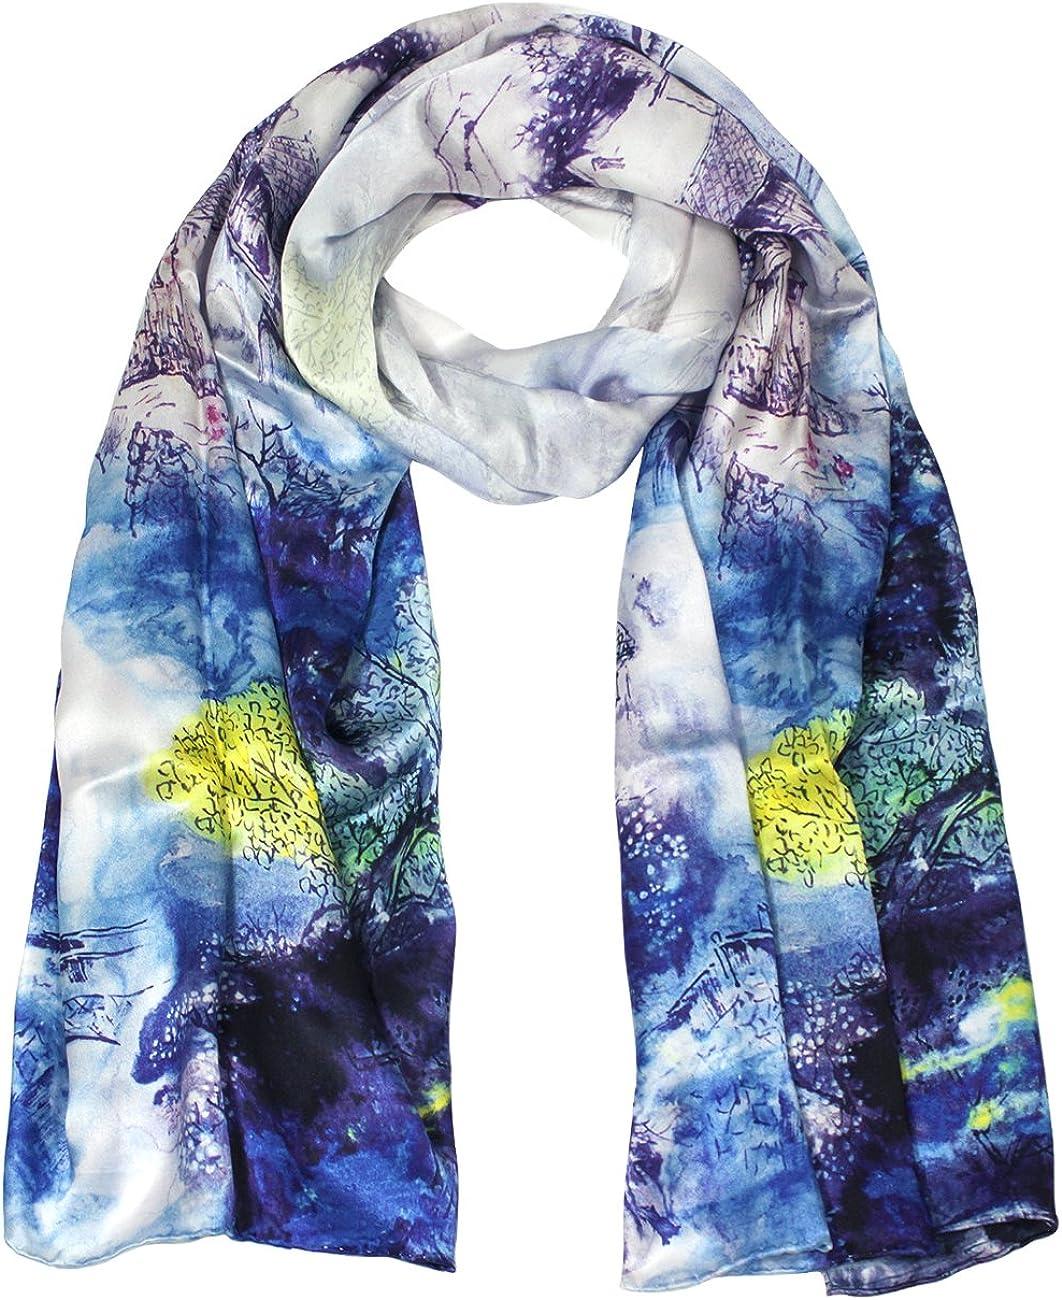 Dahlia Women's 100% Luxury Long Charmeuse Silk Scarf - Flower Village Painting